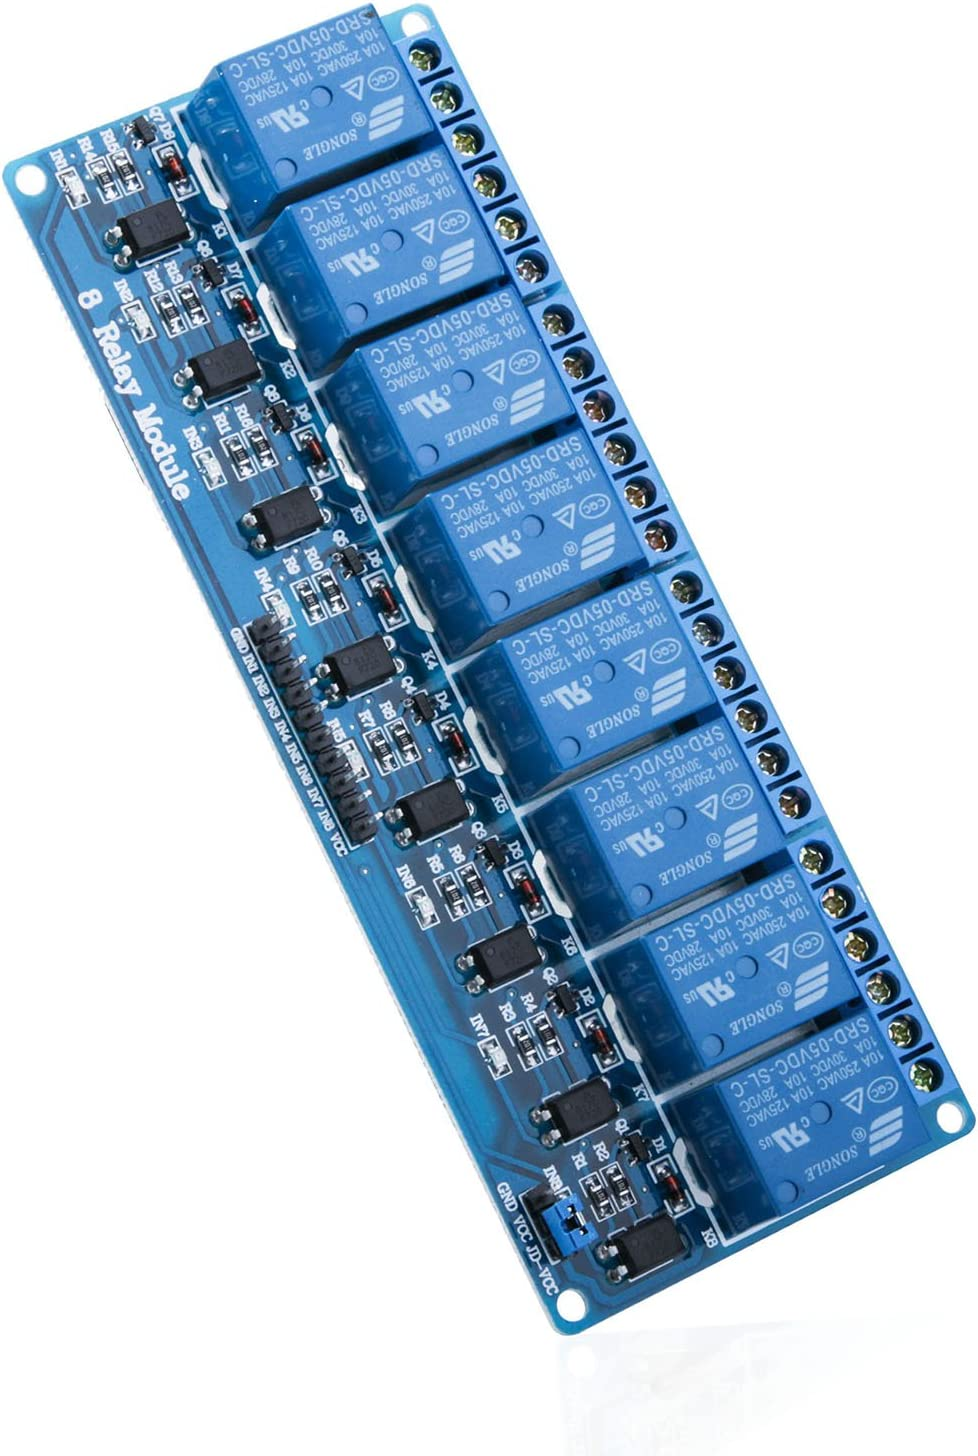 ELEGOO Módulo Relé de 8 Channel DC 5V con Optoacoplador para Arduino UNO R3 MEGA 2560 Proyecto 1280 DSP ARM PIC AVR STM32 Raspberry Pi